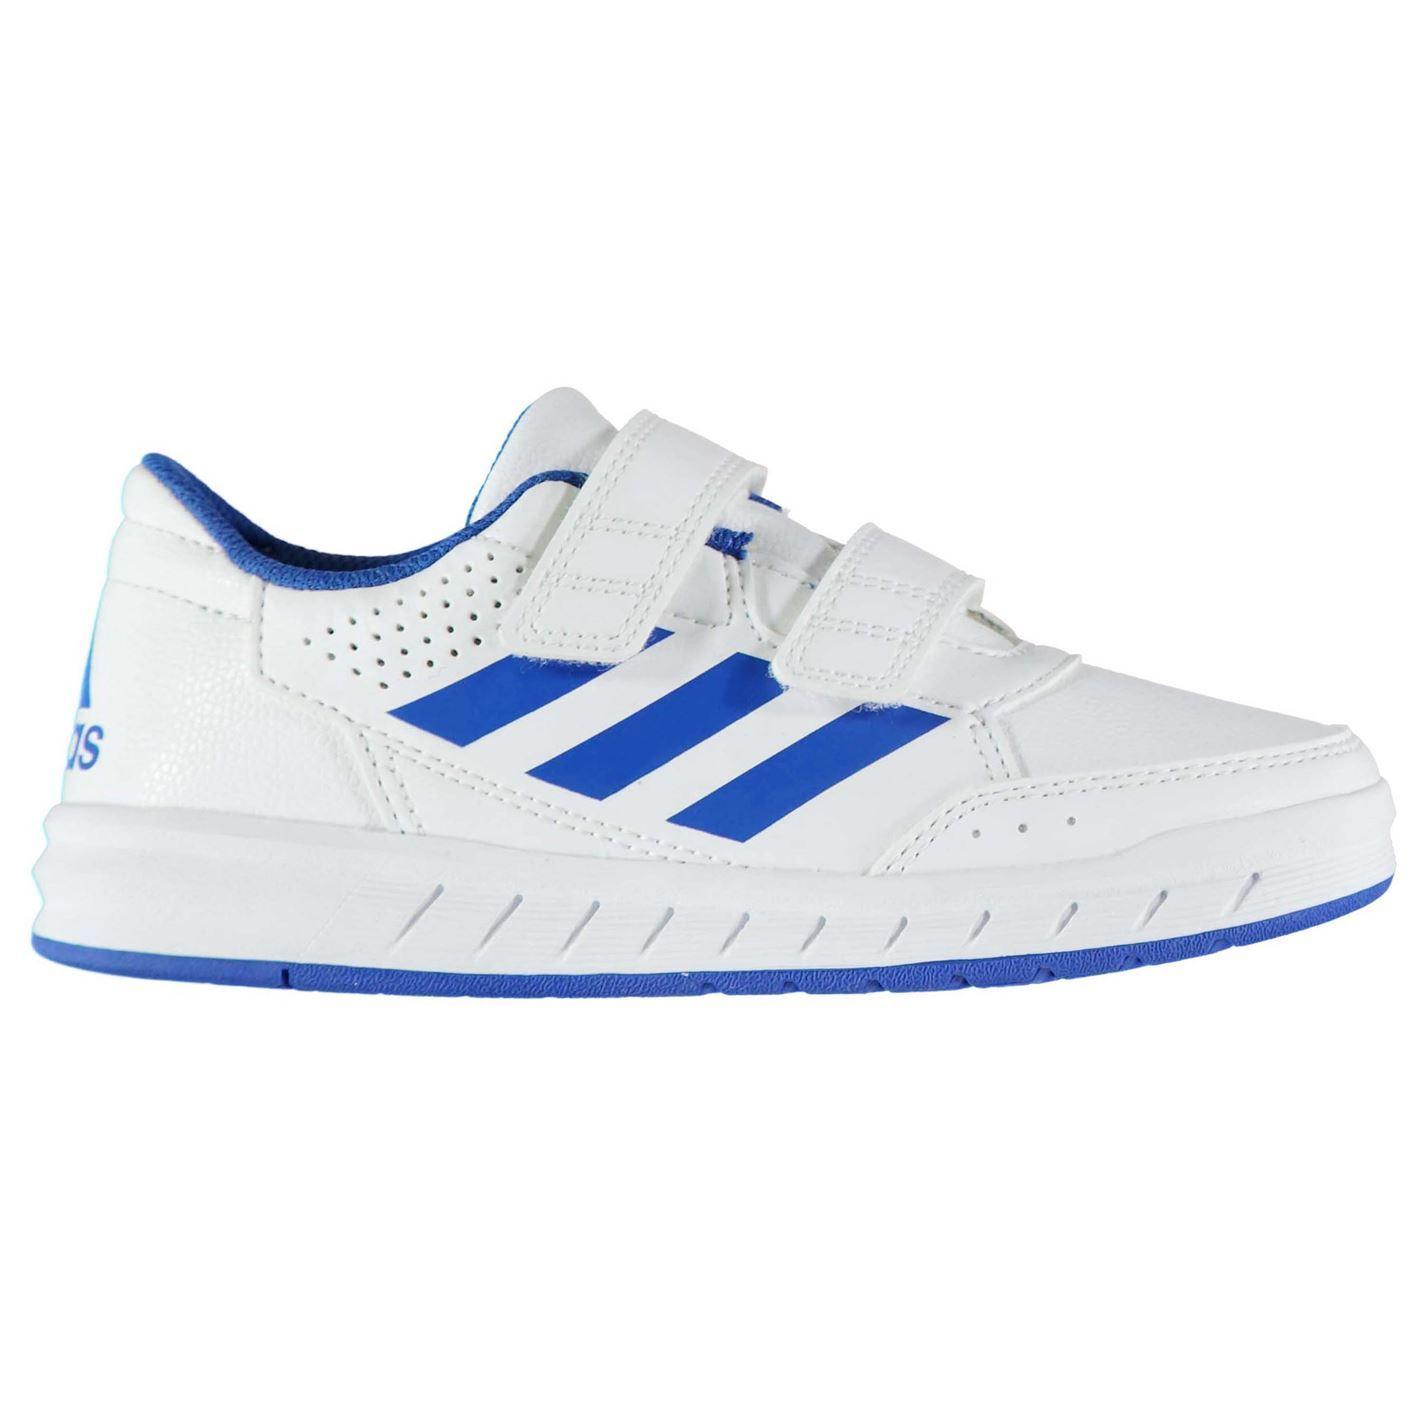 miniatura 16 - ADIDAS-alta-Sport-CF-Scarpe-da-ginnastica-bambino-ragazzo-calzature